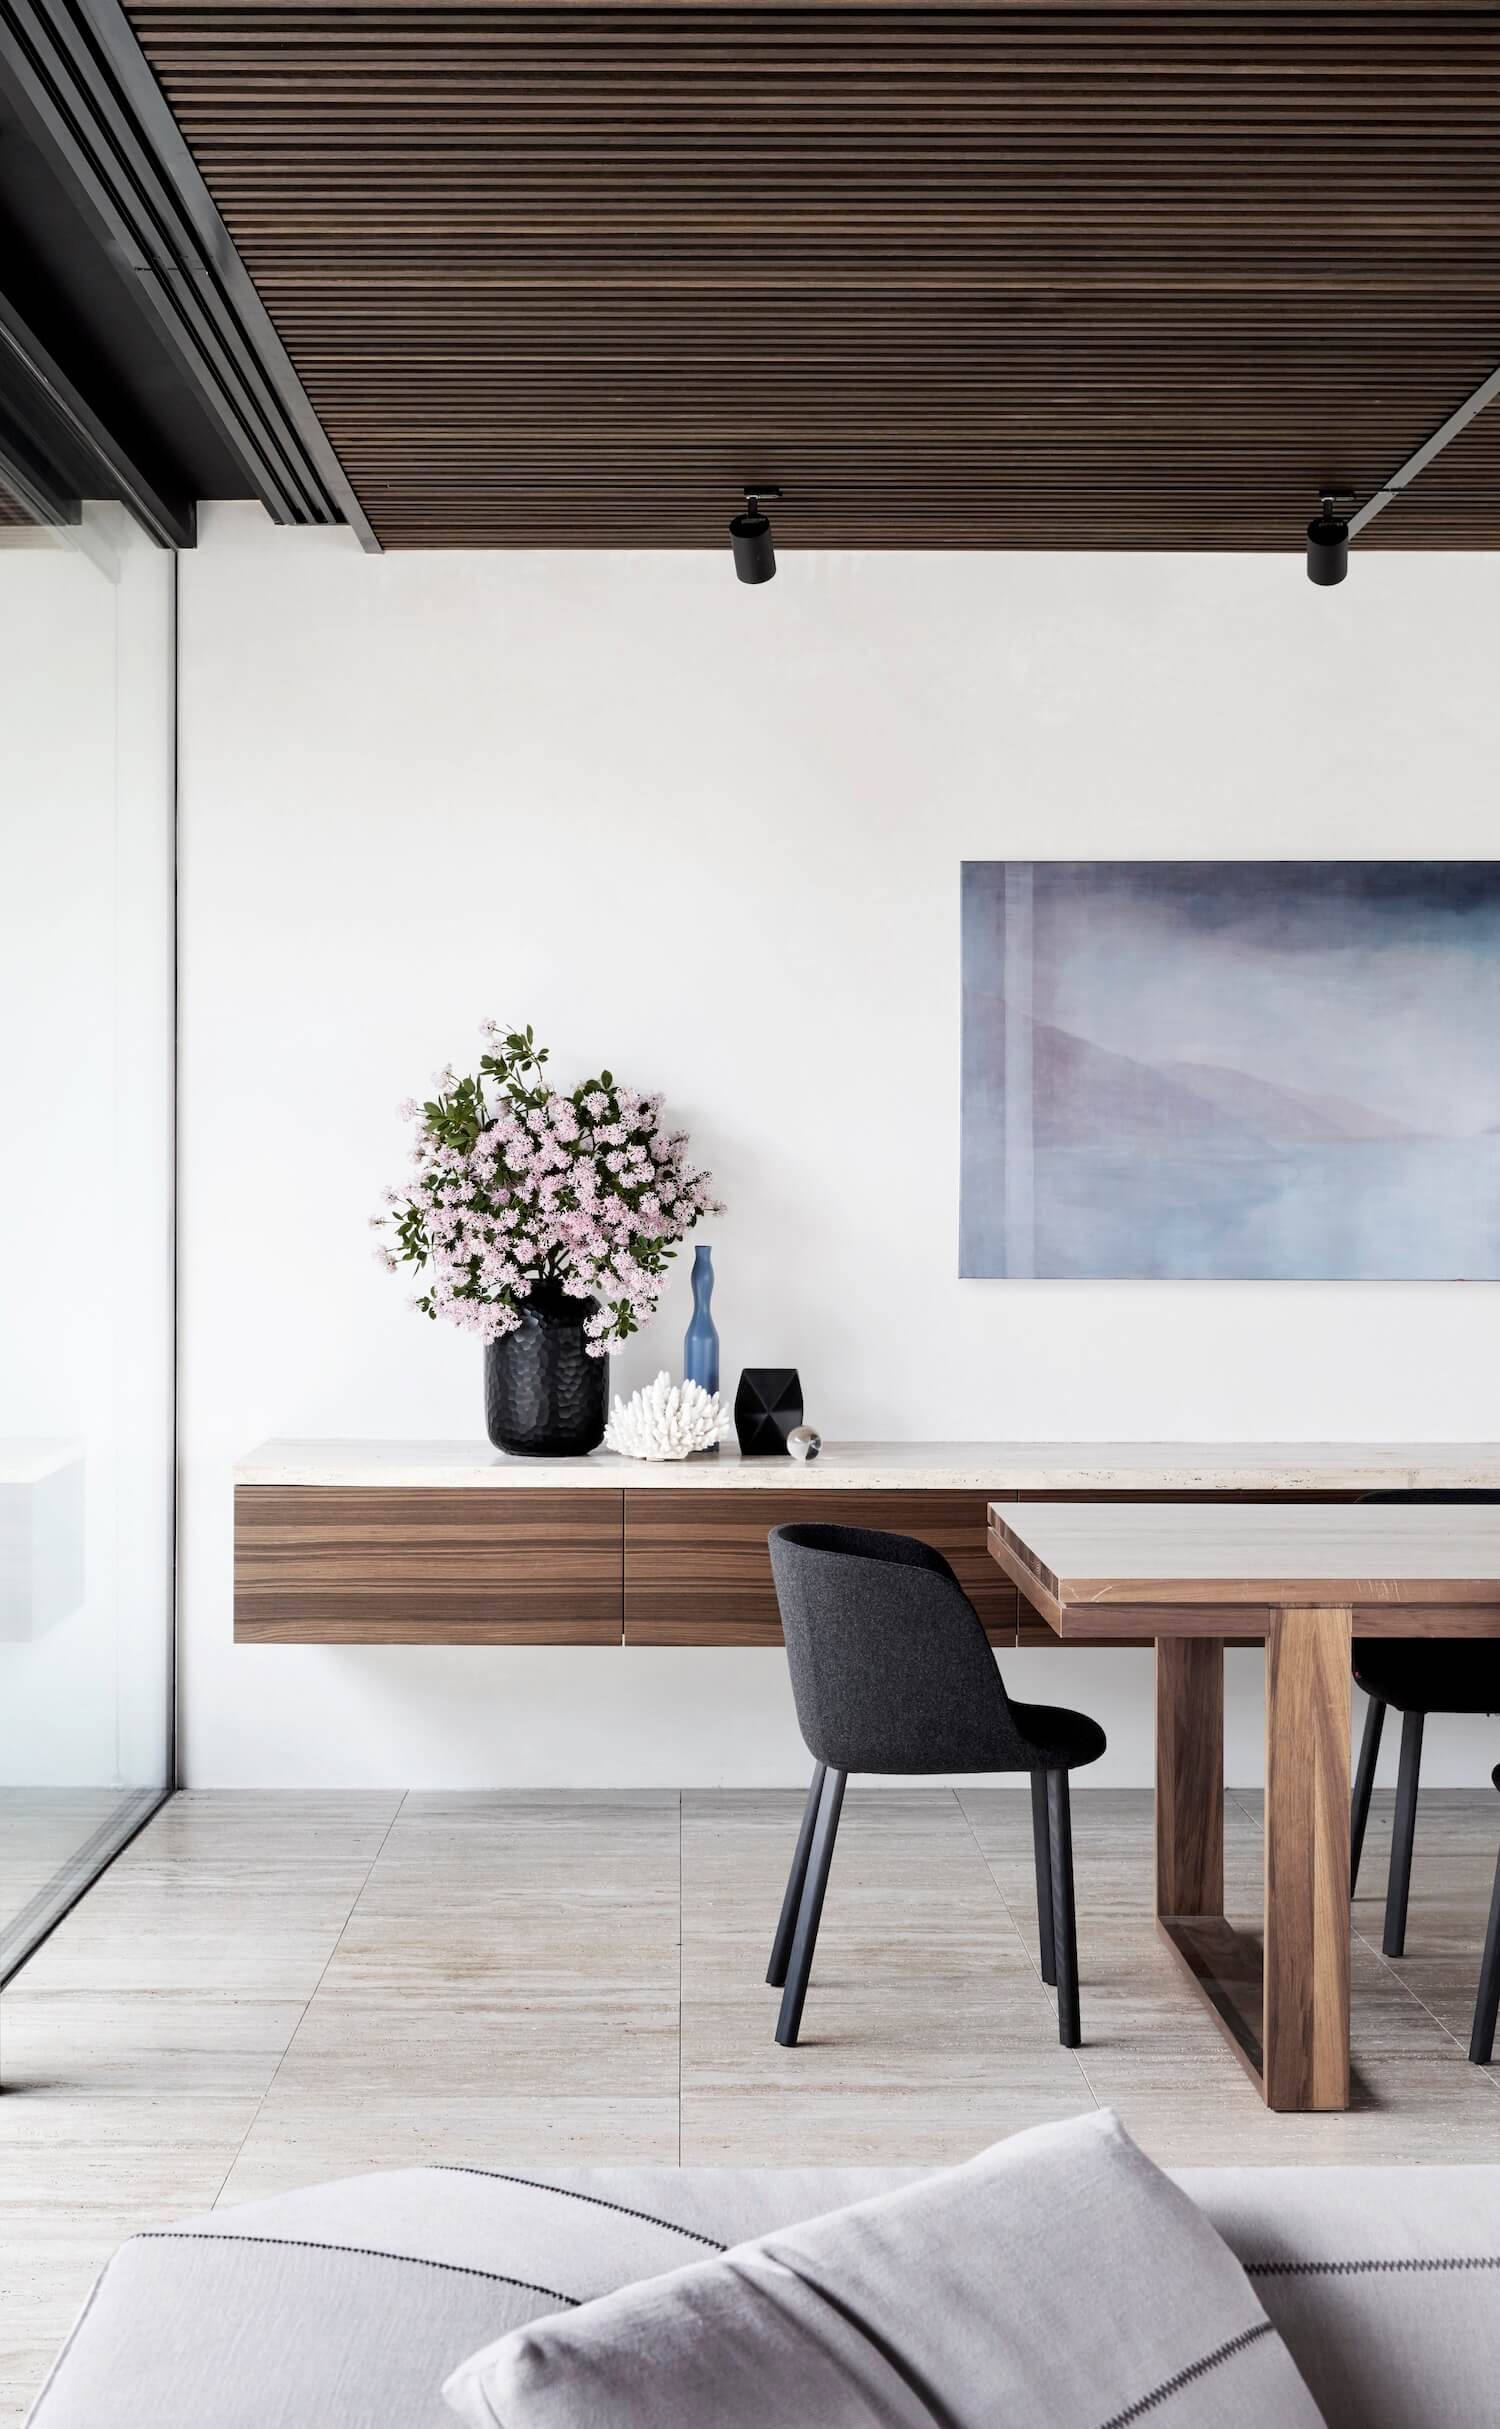 est living coy yiontis CY Harold St 0123 NOLAN HOUSE – Photographer Peter Clarke stylist Swee Lim